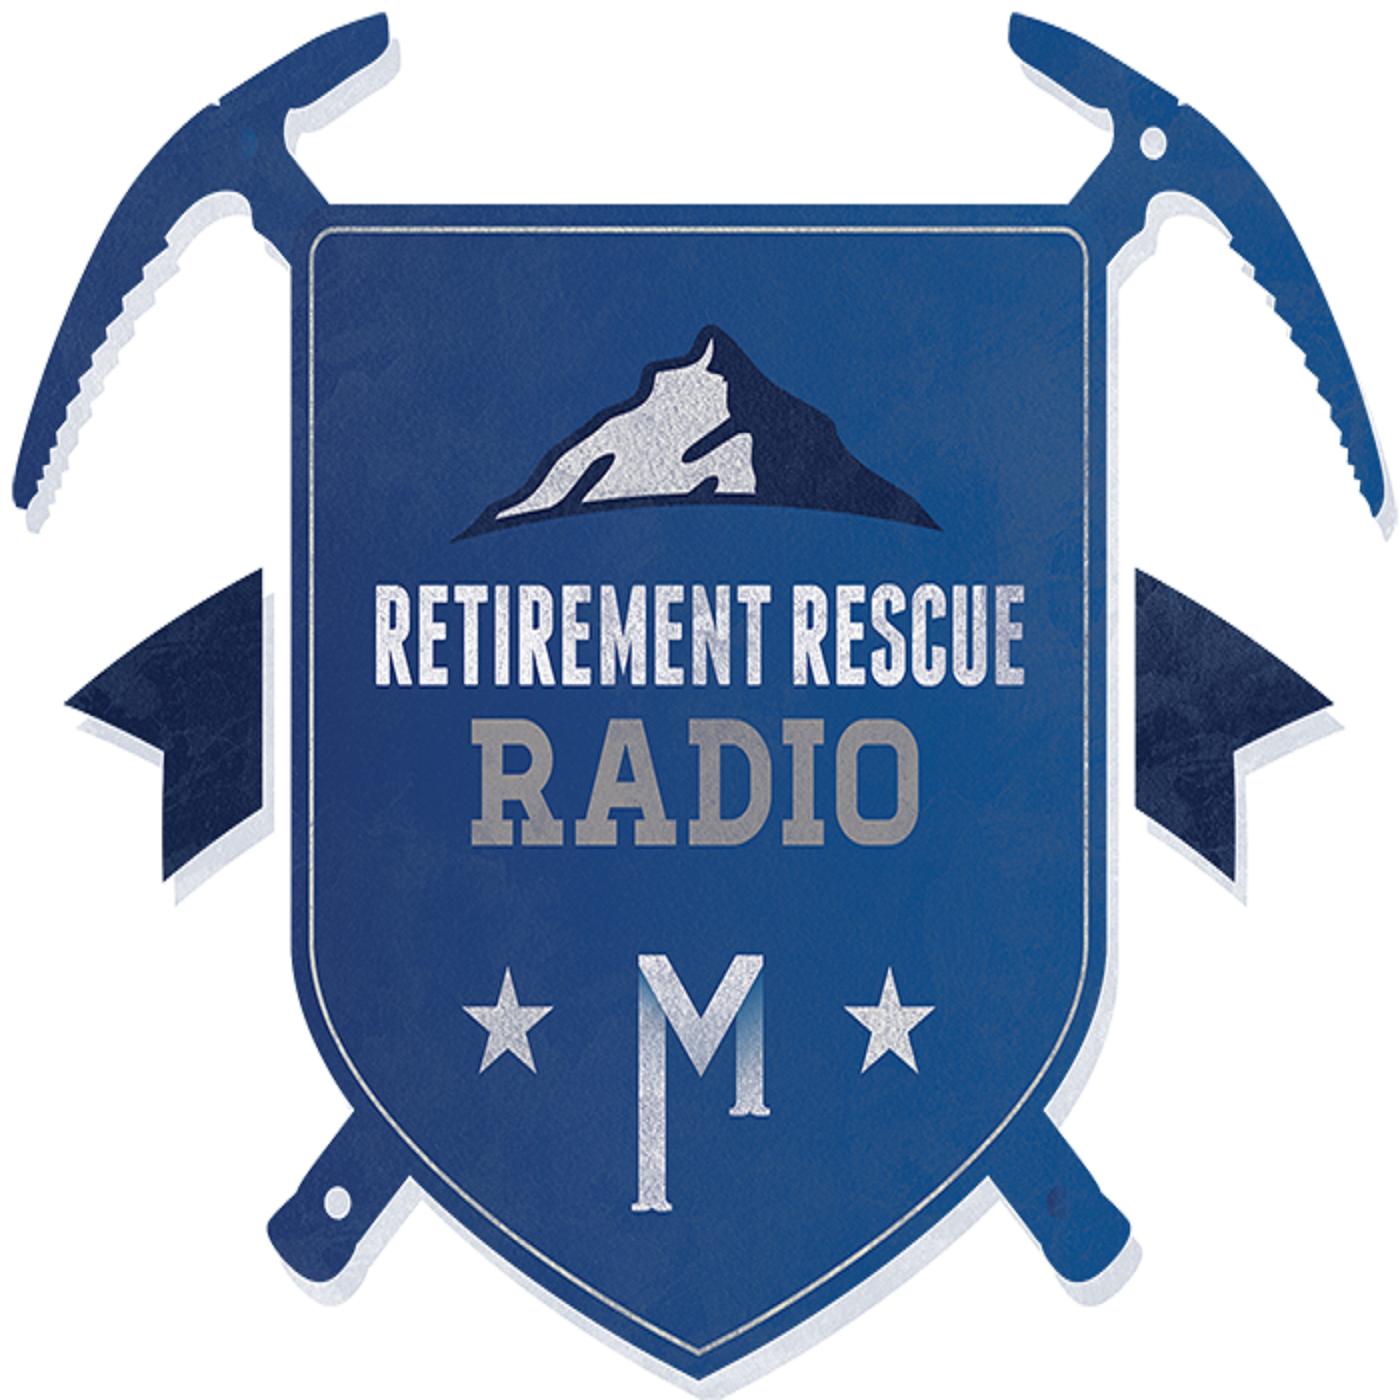 Retirement Rescue Radio show art